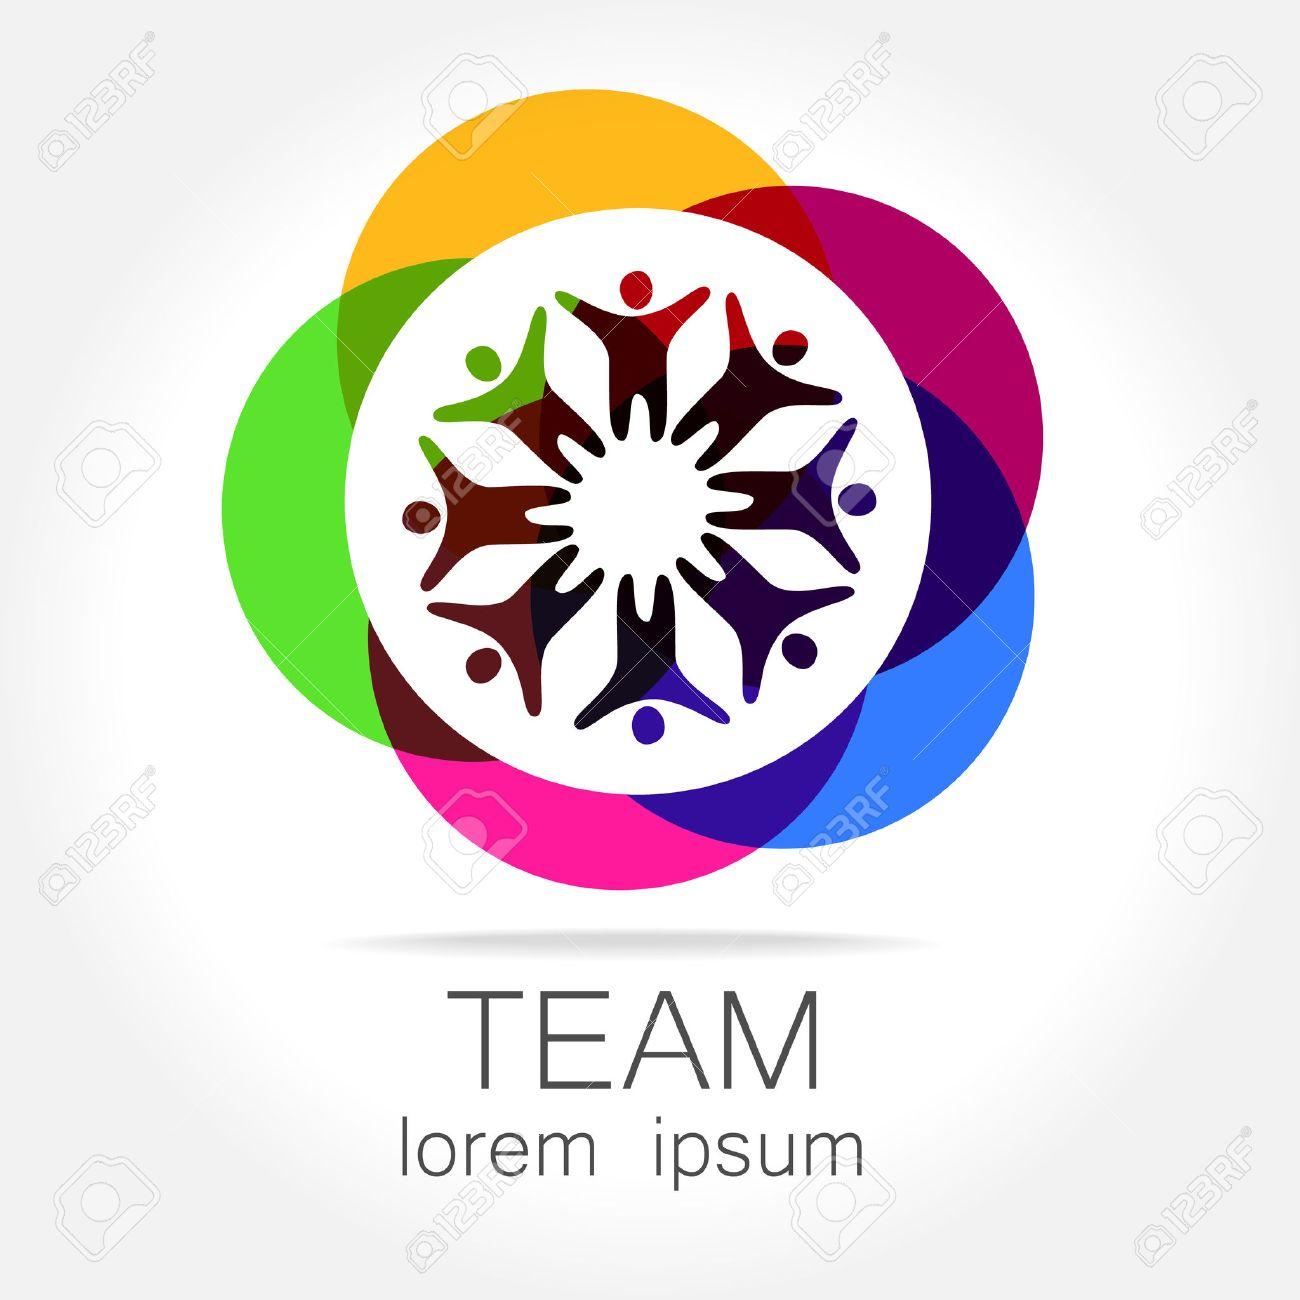 team logo template social media marketing idea corporate symbol